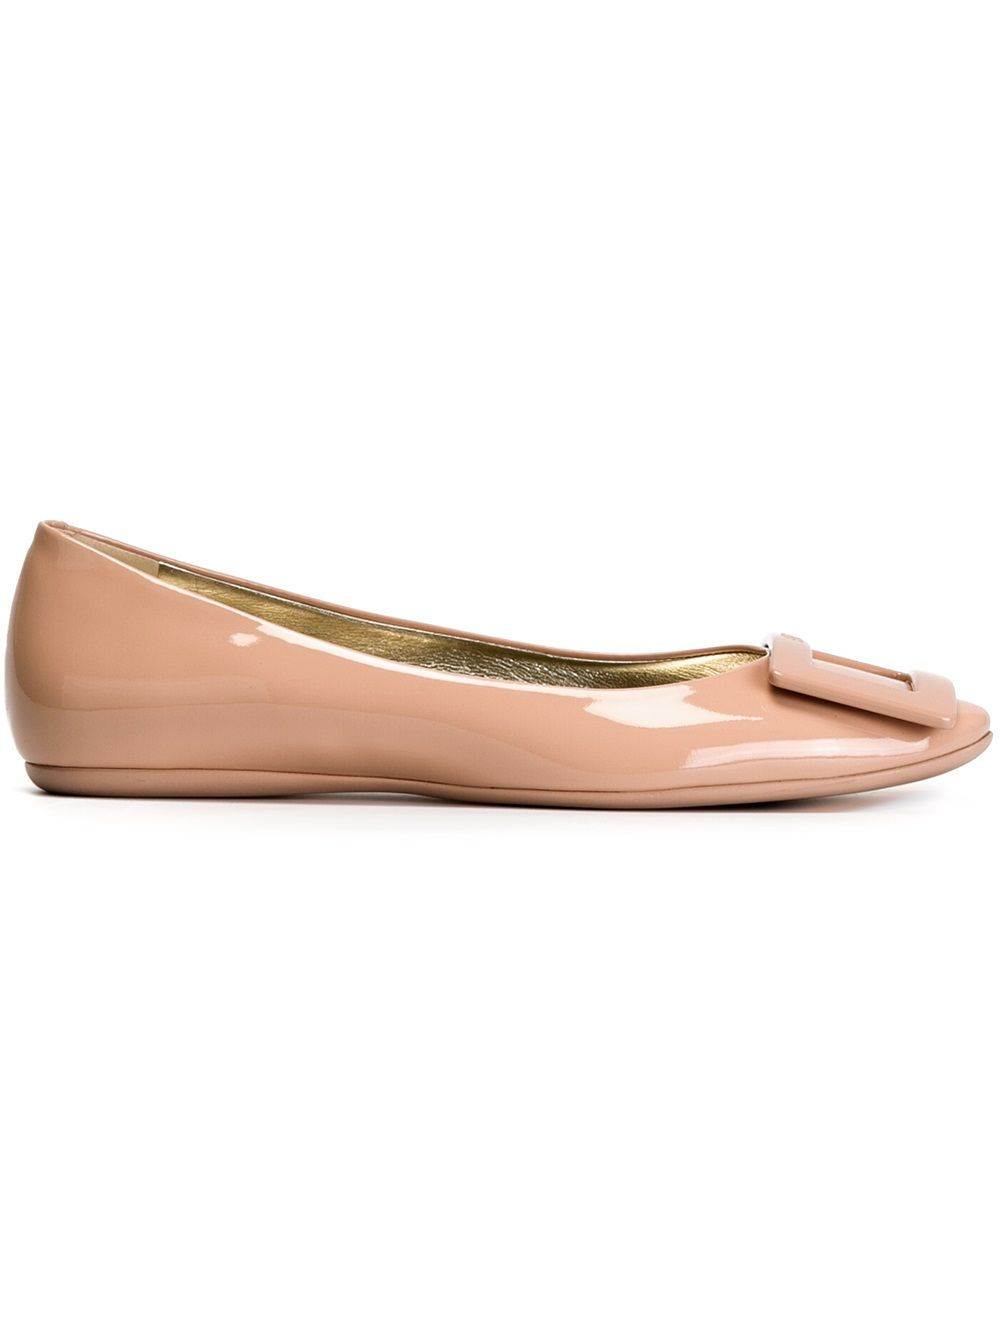 Gommette Leather Ballet Flats